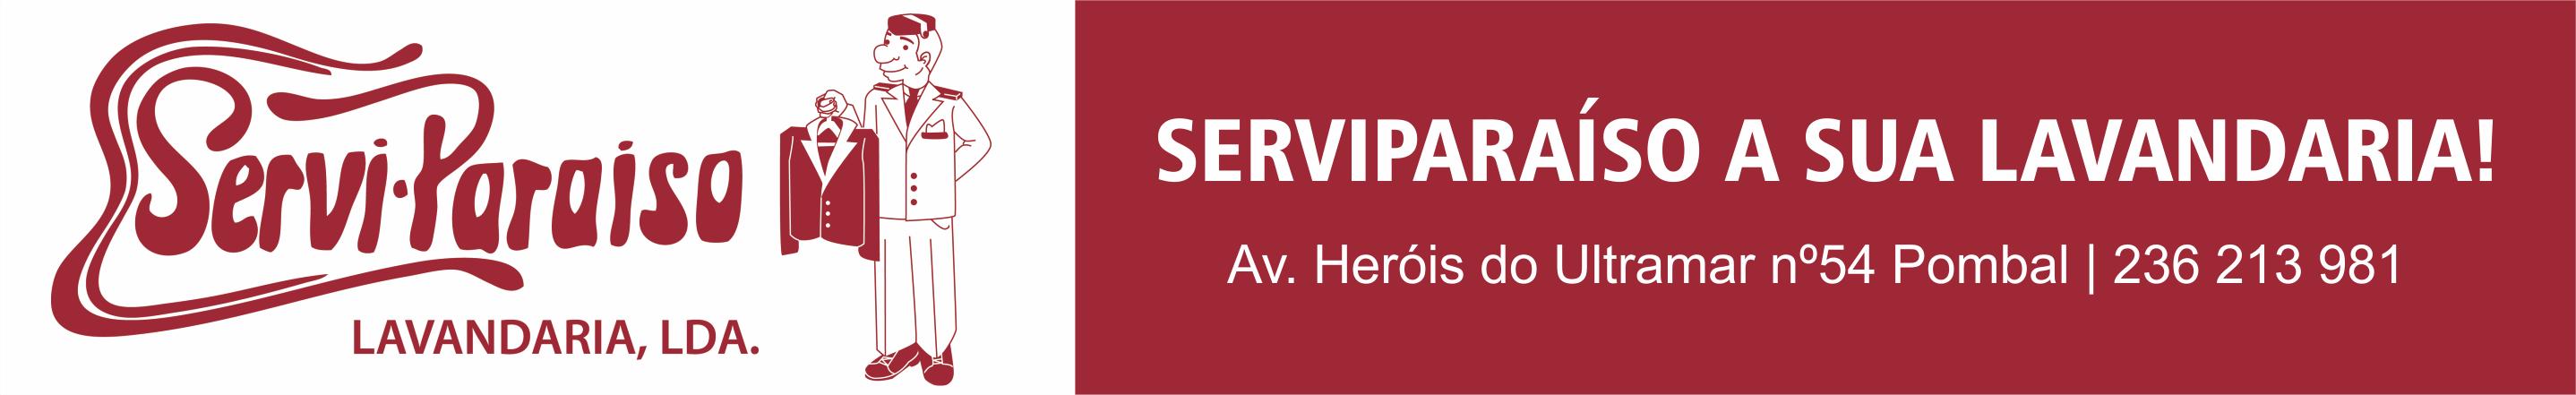 https://www.facebook.com/Servi-Para%C3%ADso-Lavandaria-Lda-123894854350671/